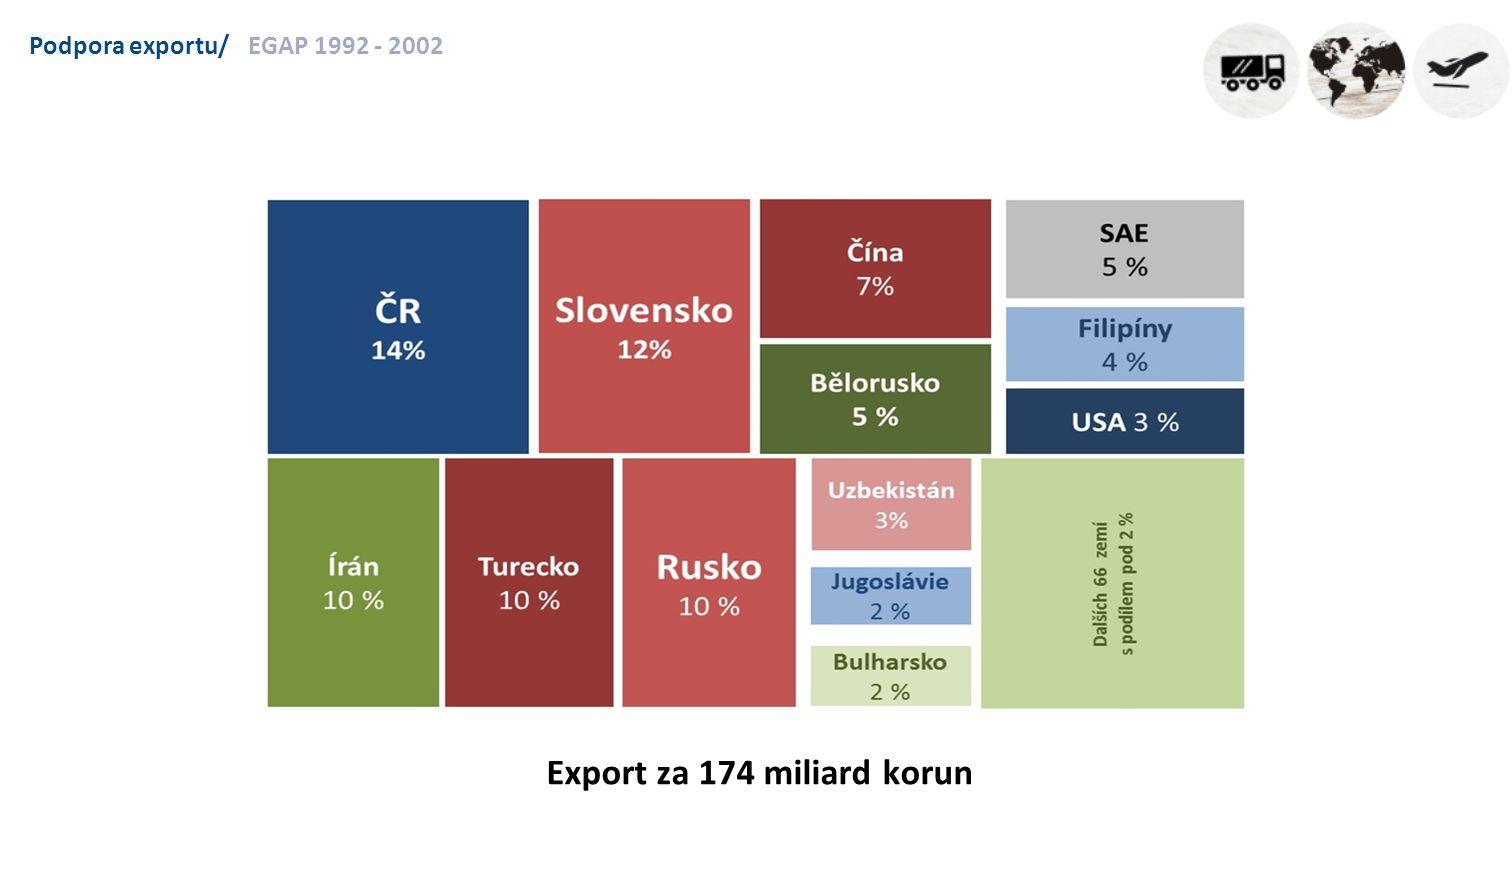 Podpora exportu/EGAP 1992 - 2002